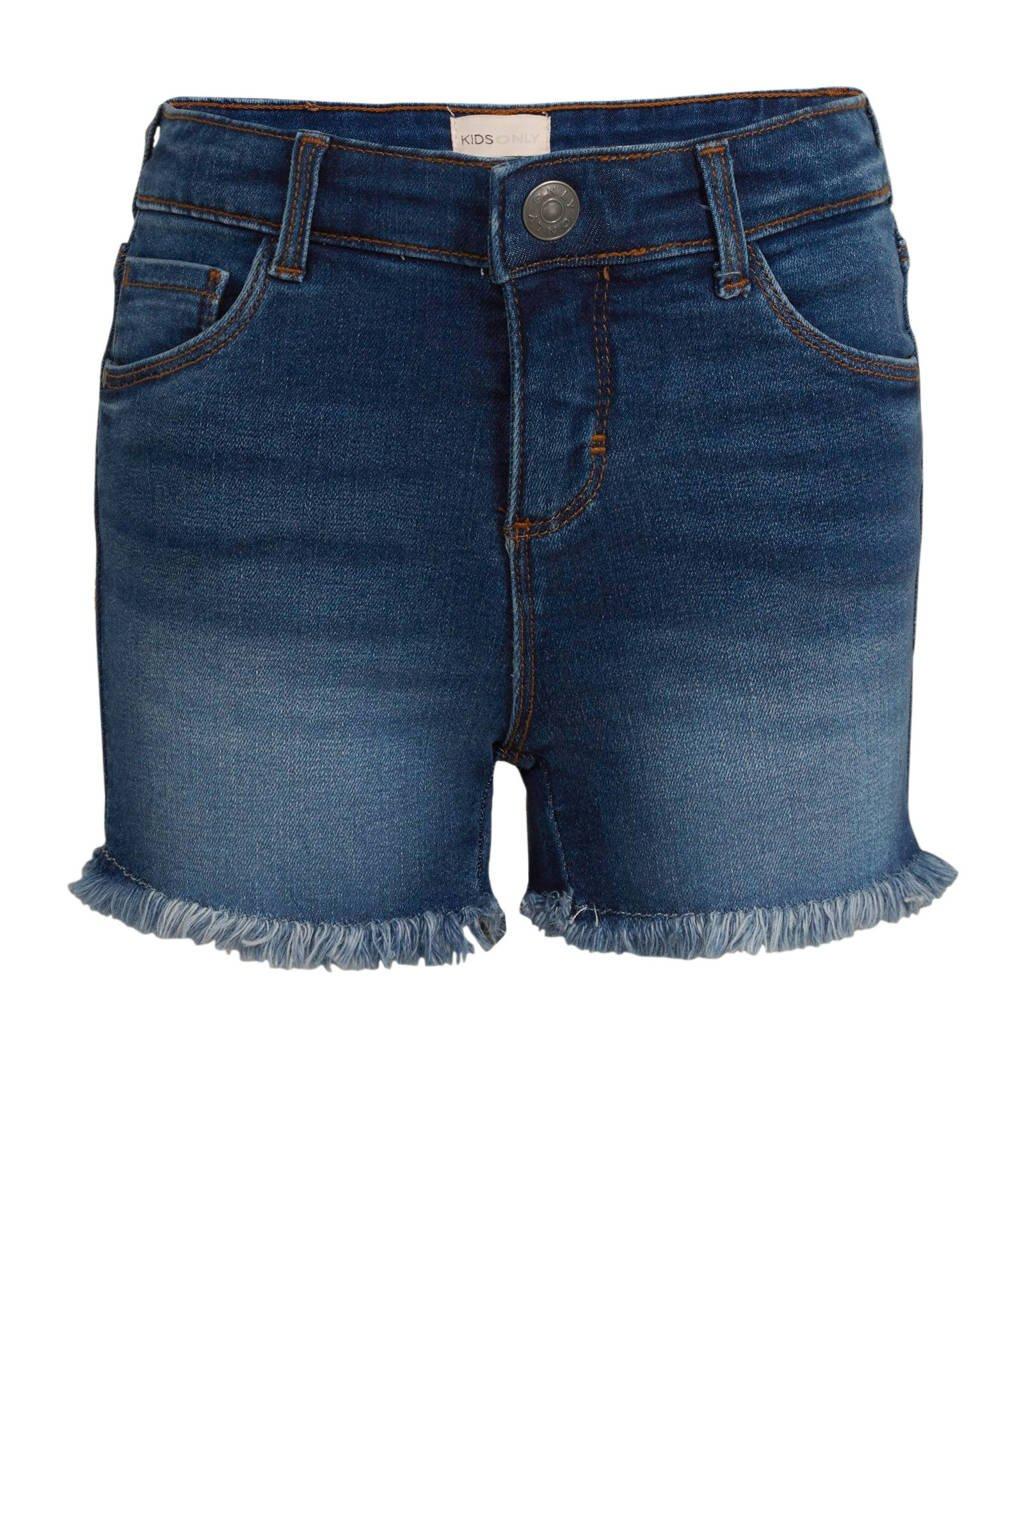 KIDS ONLY high waist straight fit jeans short Rachel light denim, Light denim